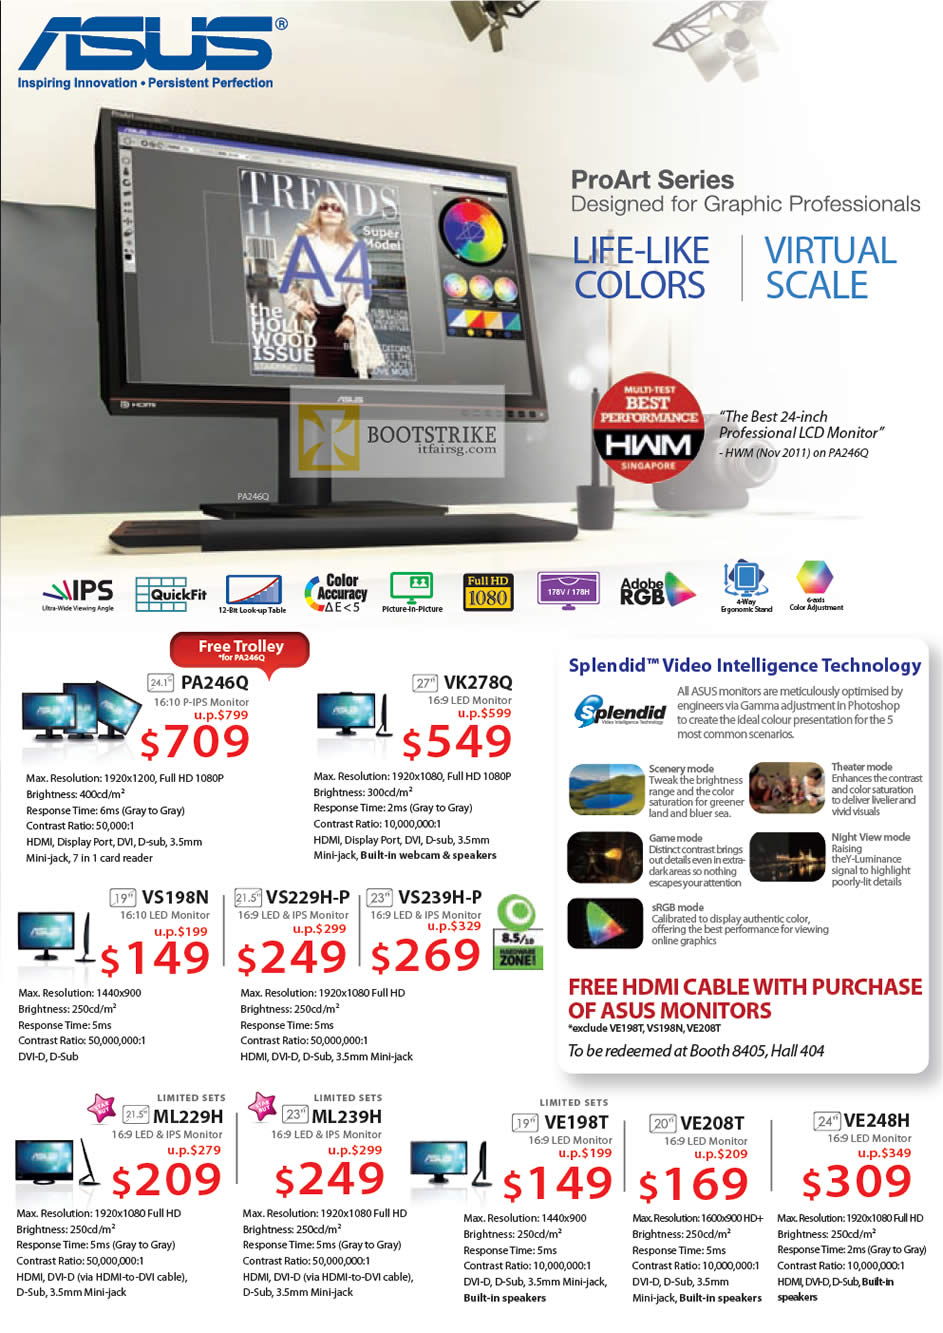 IT SHOW 2012 price list image brochure of ASUS Monitors ProArt LED IPS, PA246Q, VK278Q, VS198N, VS229H-P, VS239H-P, ML229H, ML239H, VE198T, VE208T, VE248H